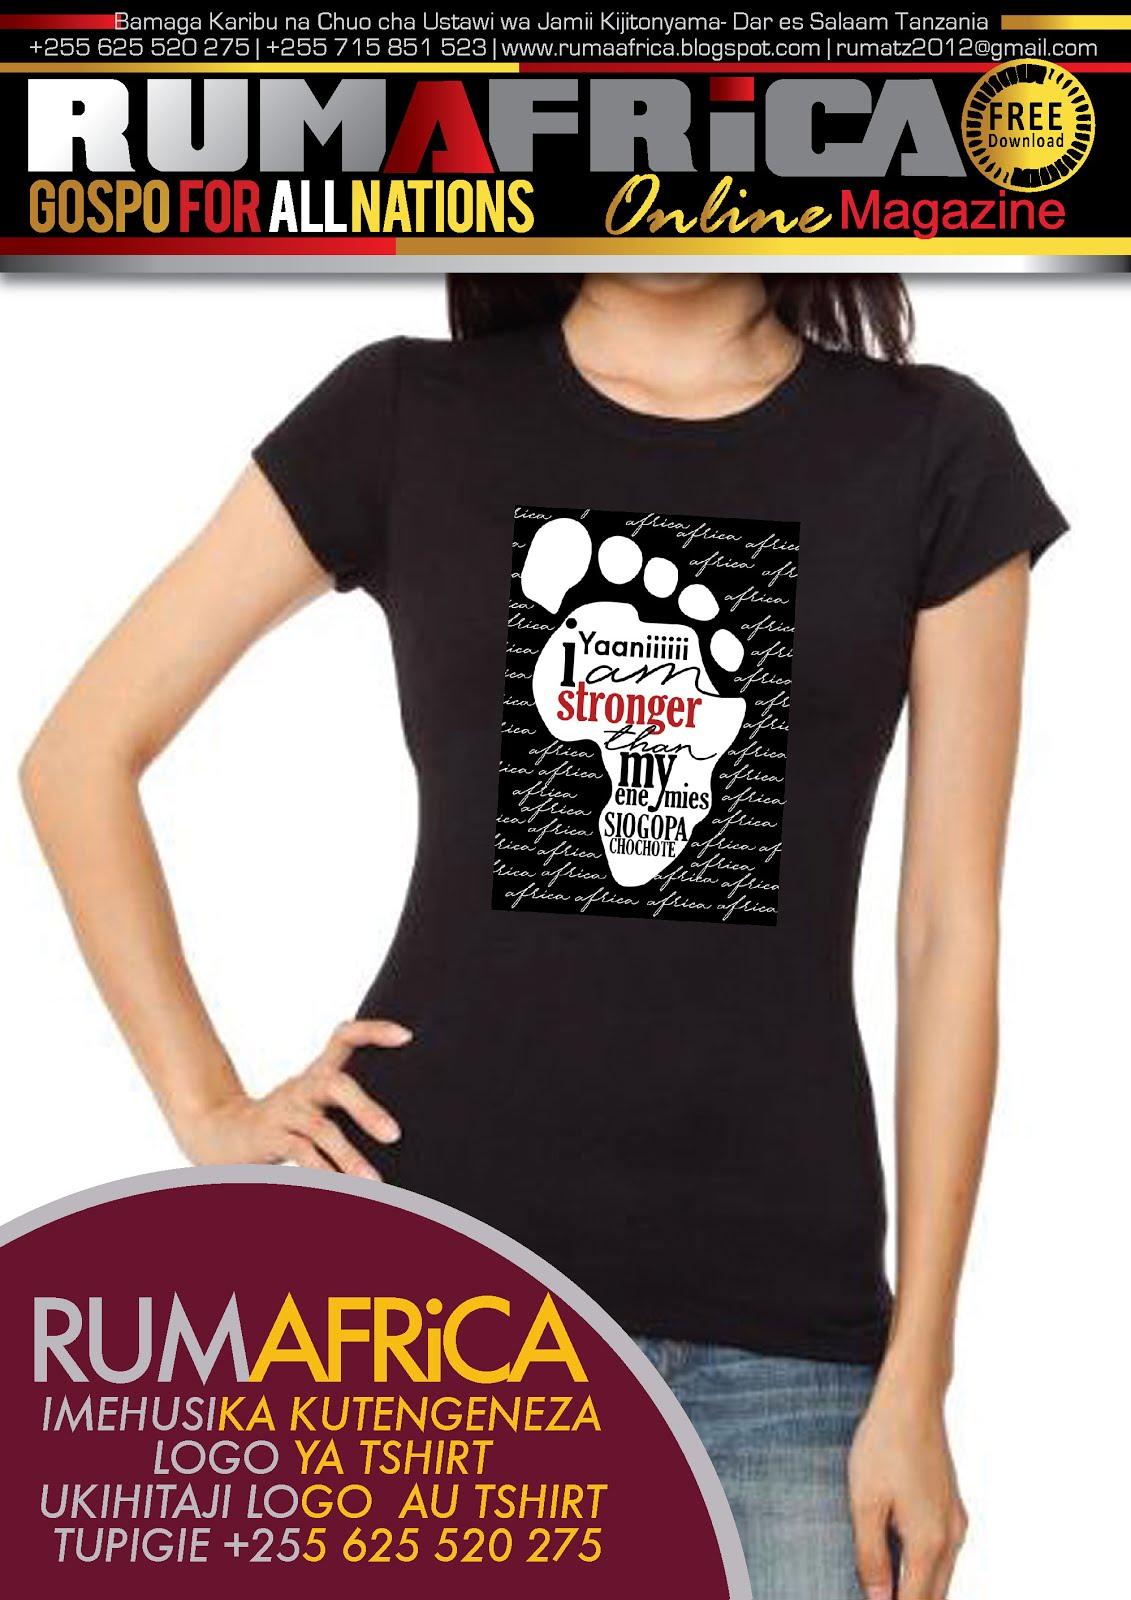 RUMAFRICA TSHIRTS